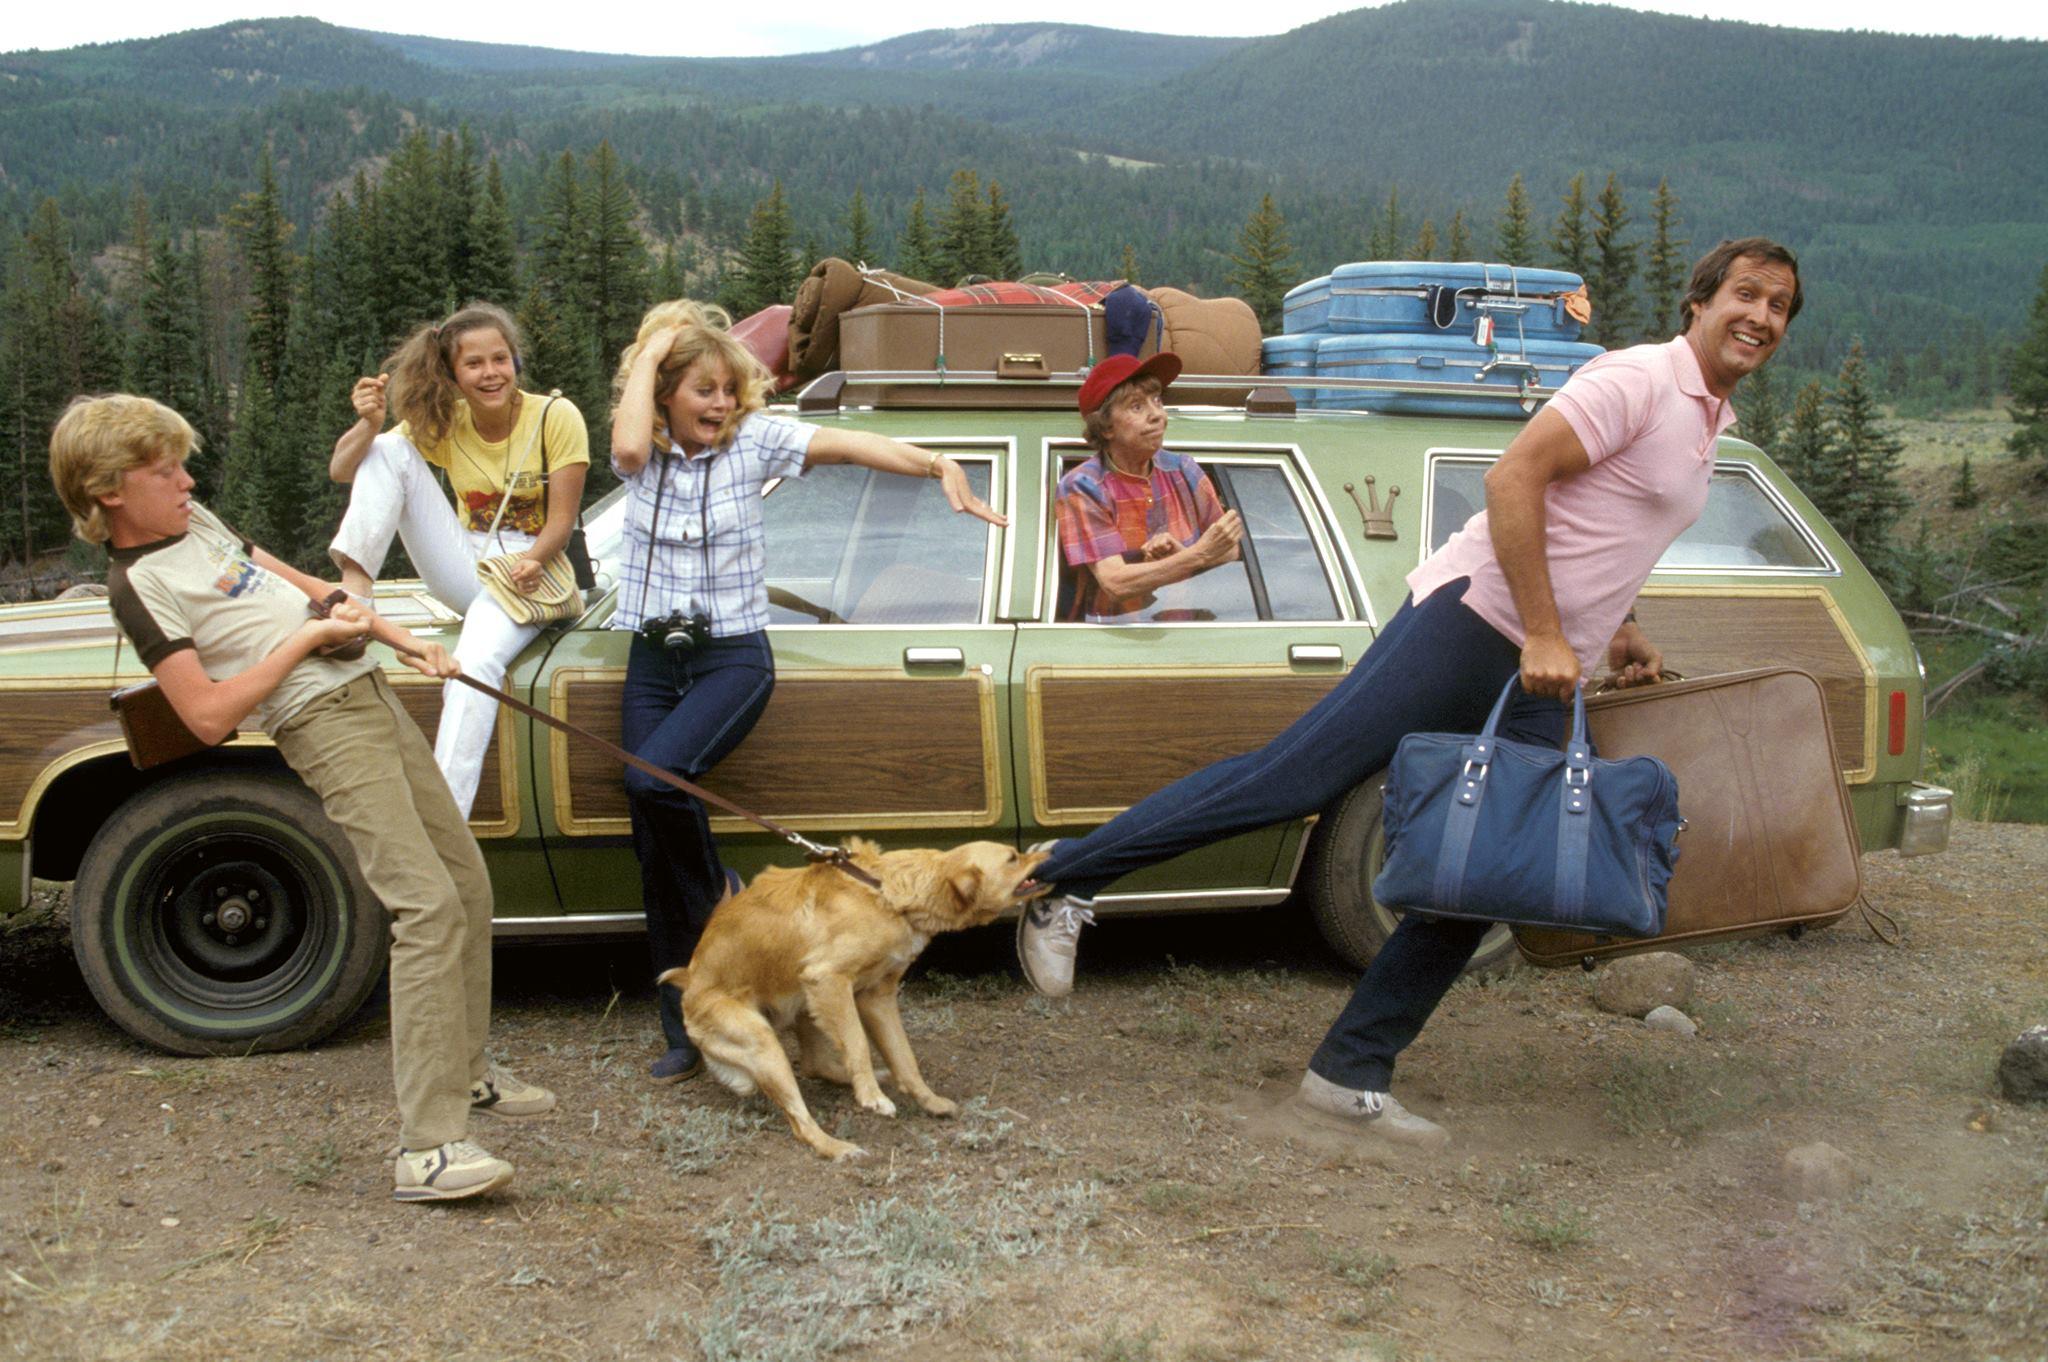 2 29 The Top Ten Funniest Films Of The 1980s